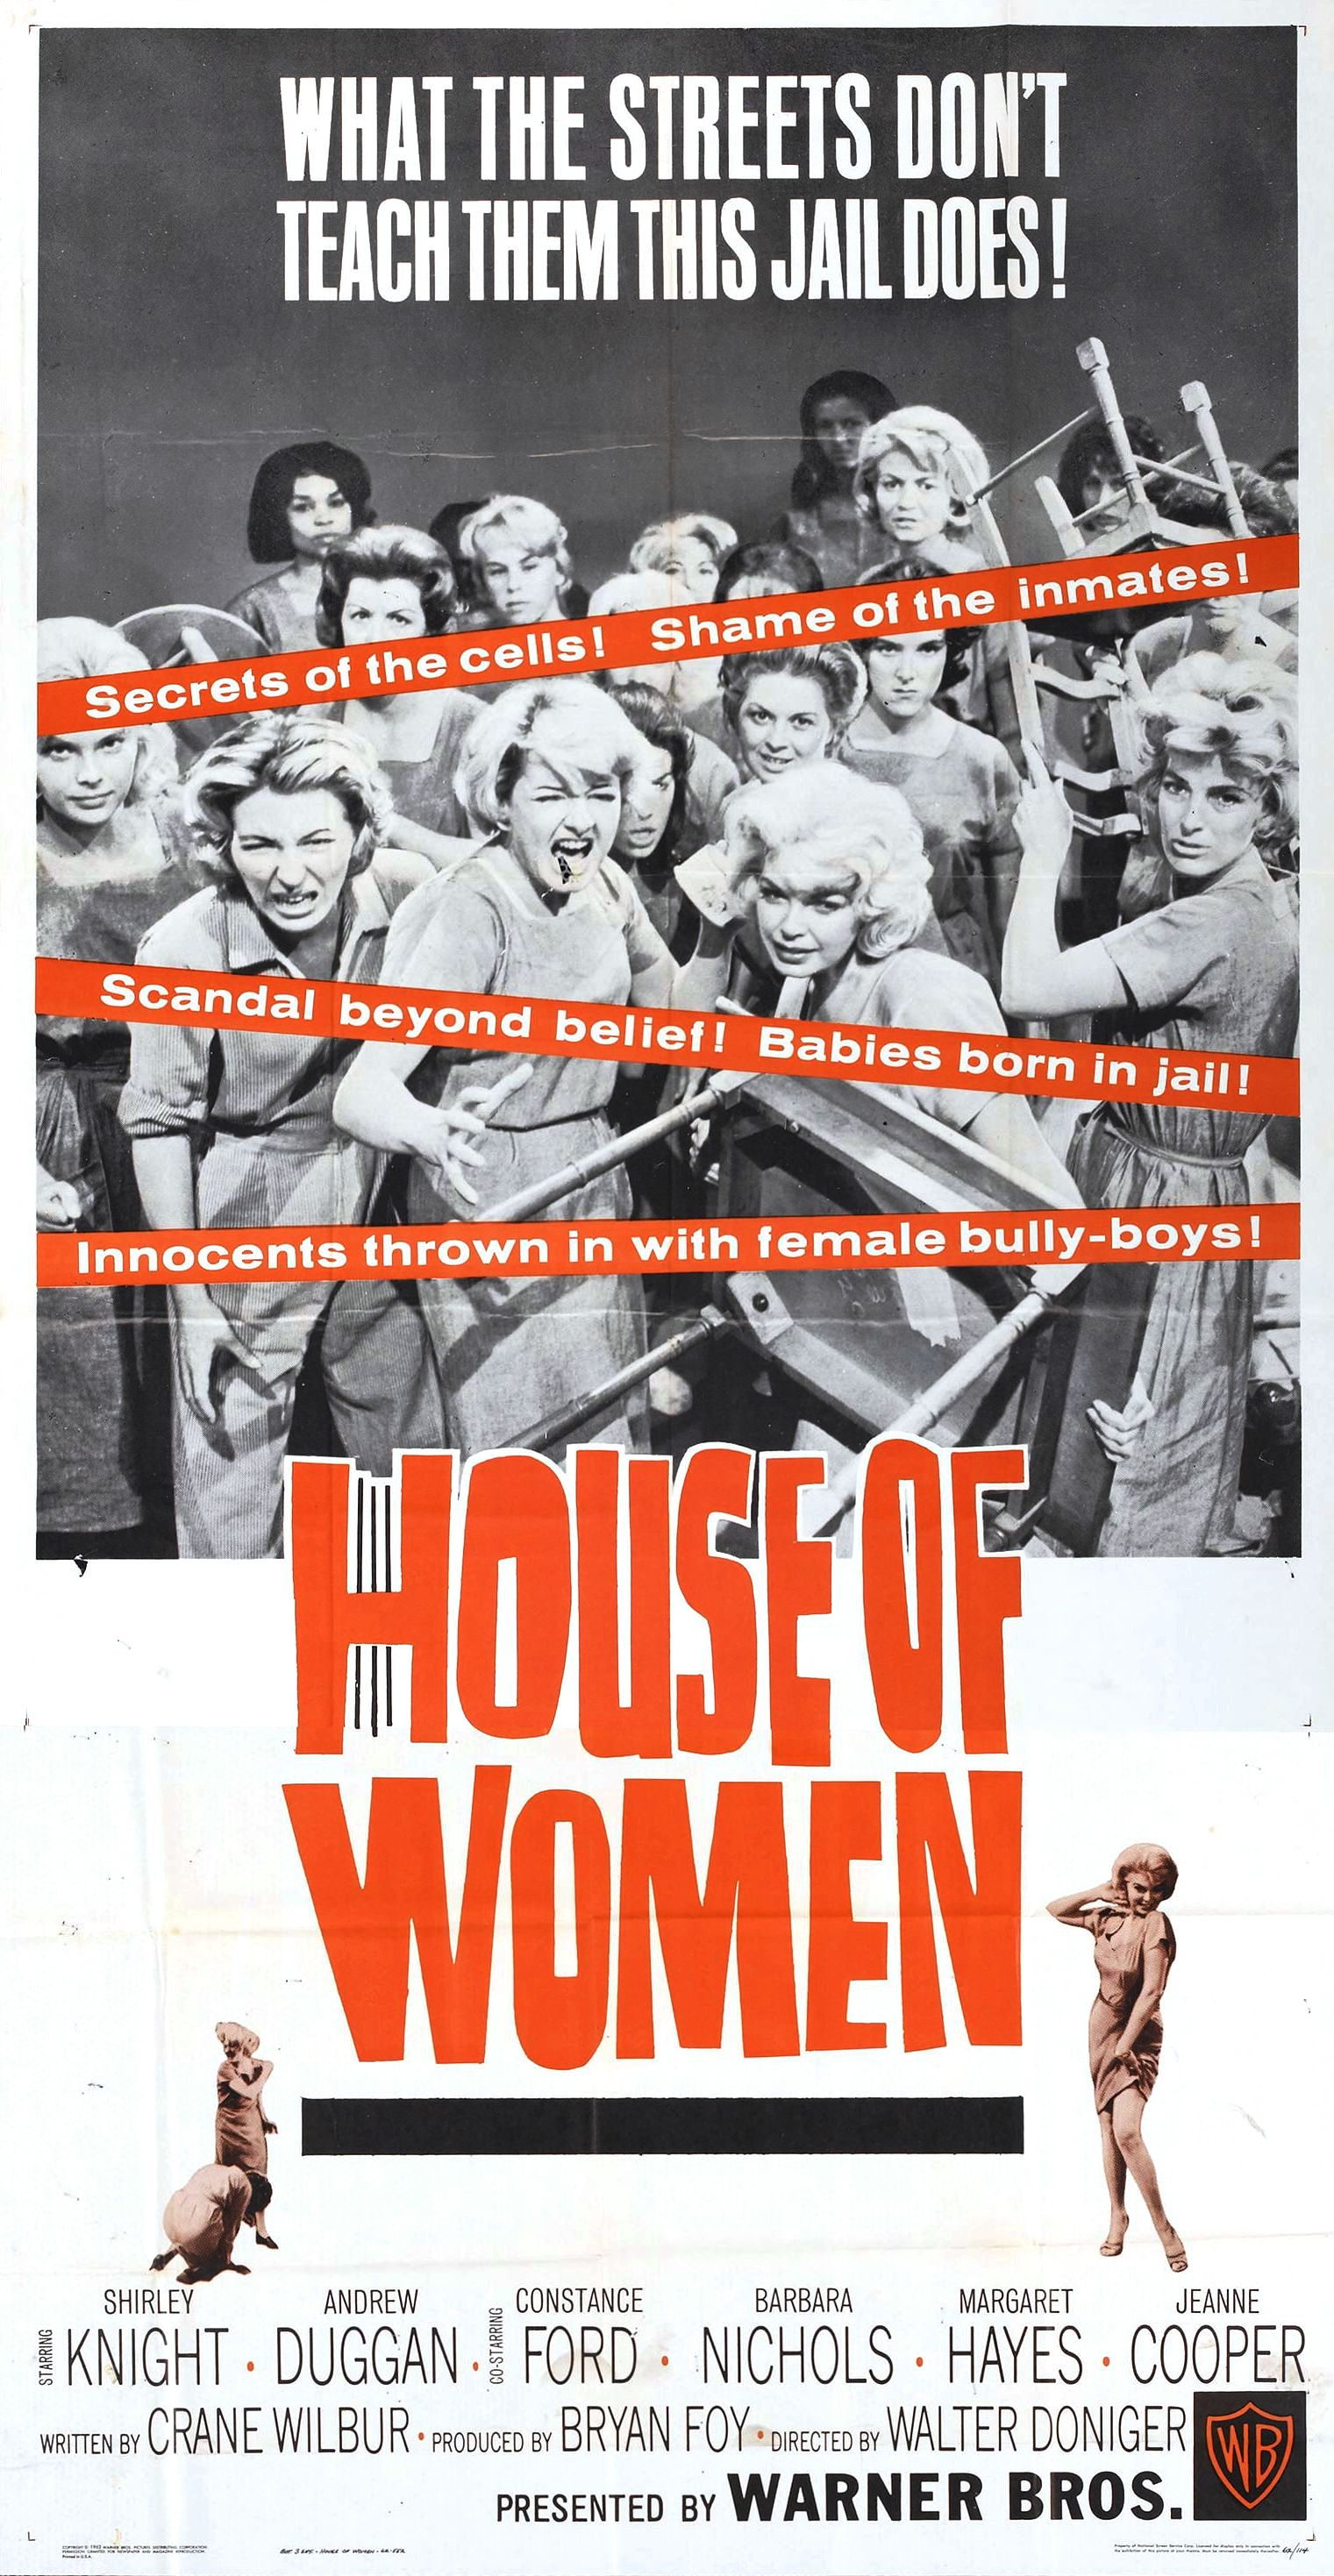 House of Women (1962)